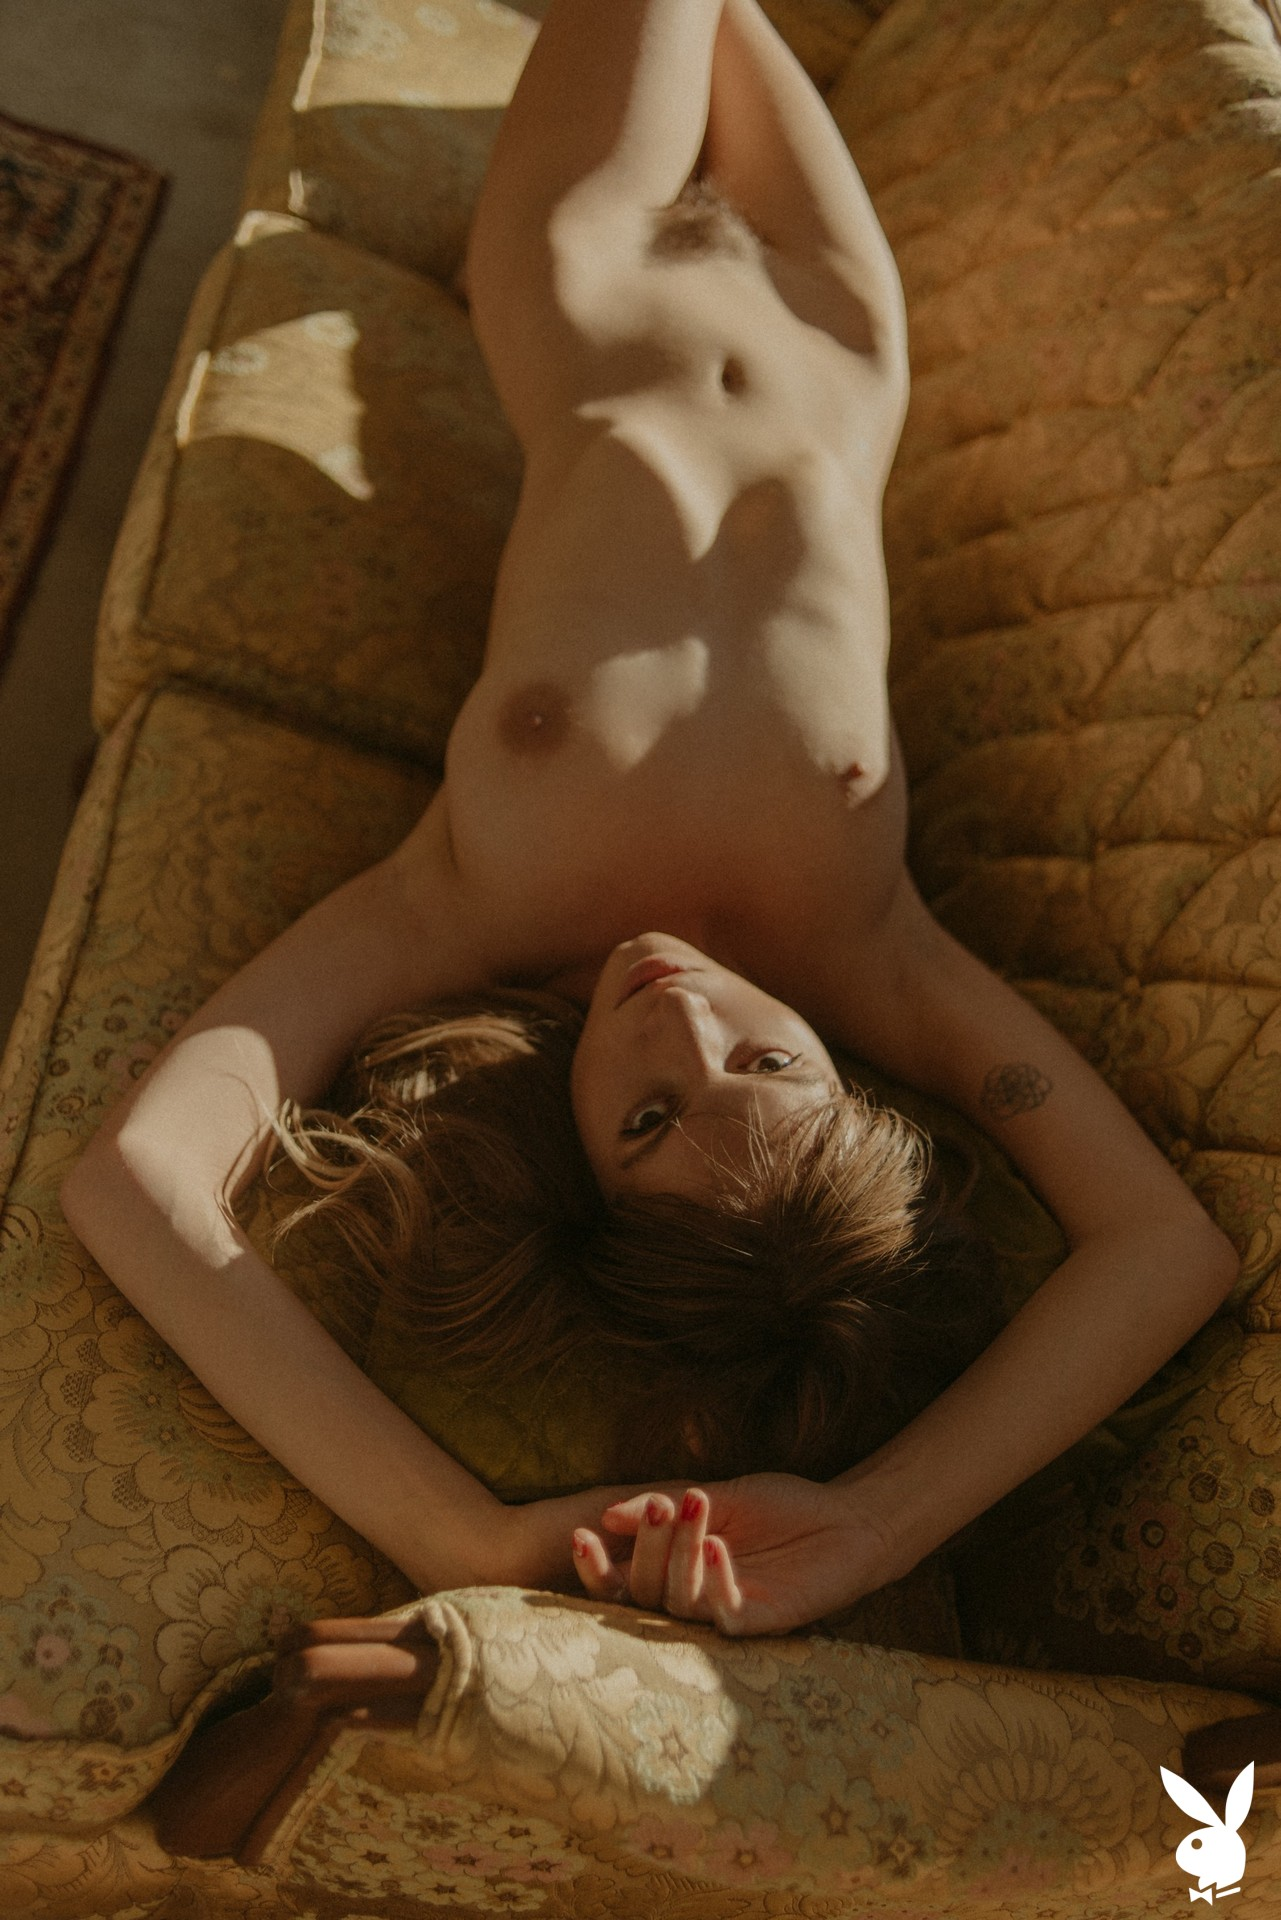 Nastasia Celeste In Creative Space Playboy Plus (32)